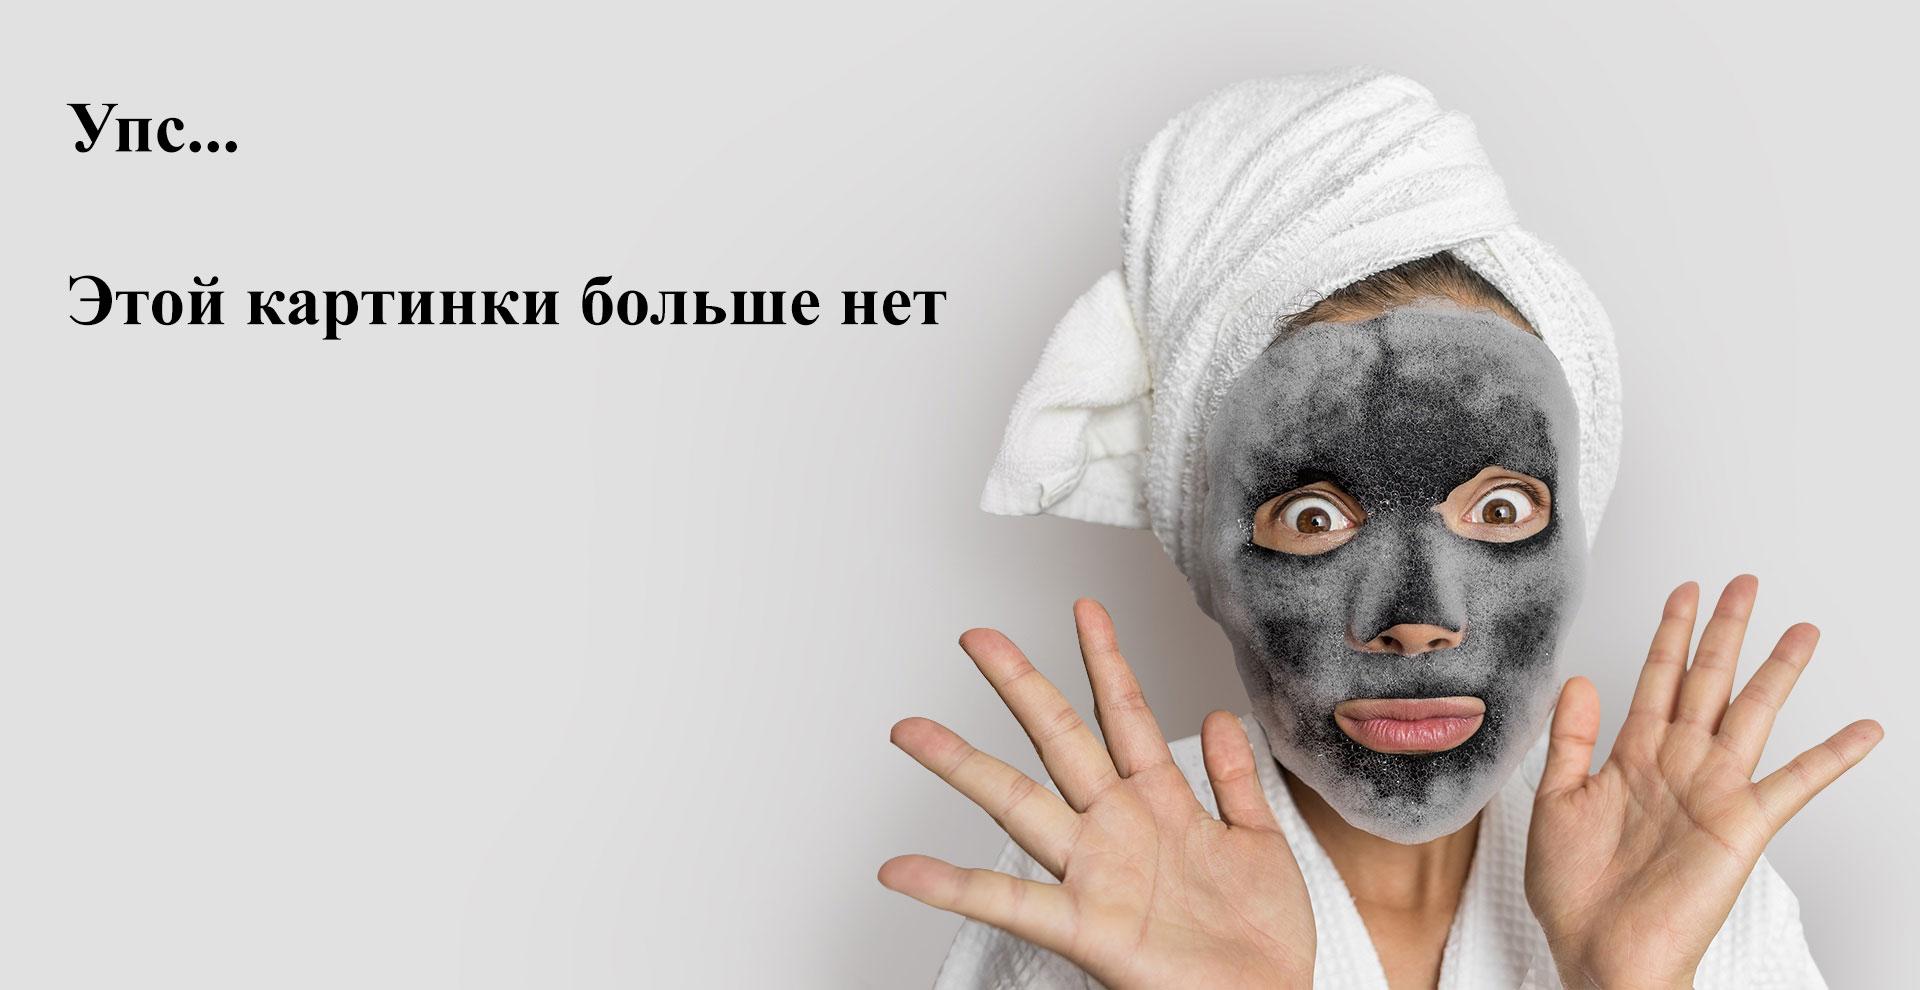 Patrisa Nail, Гель-лак Московская сага №743